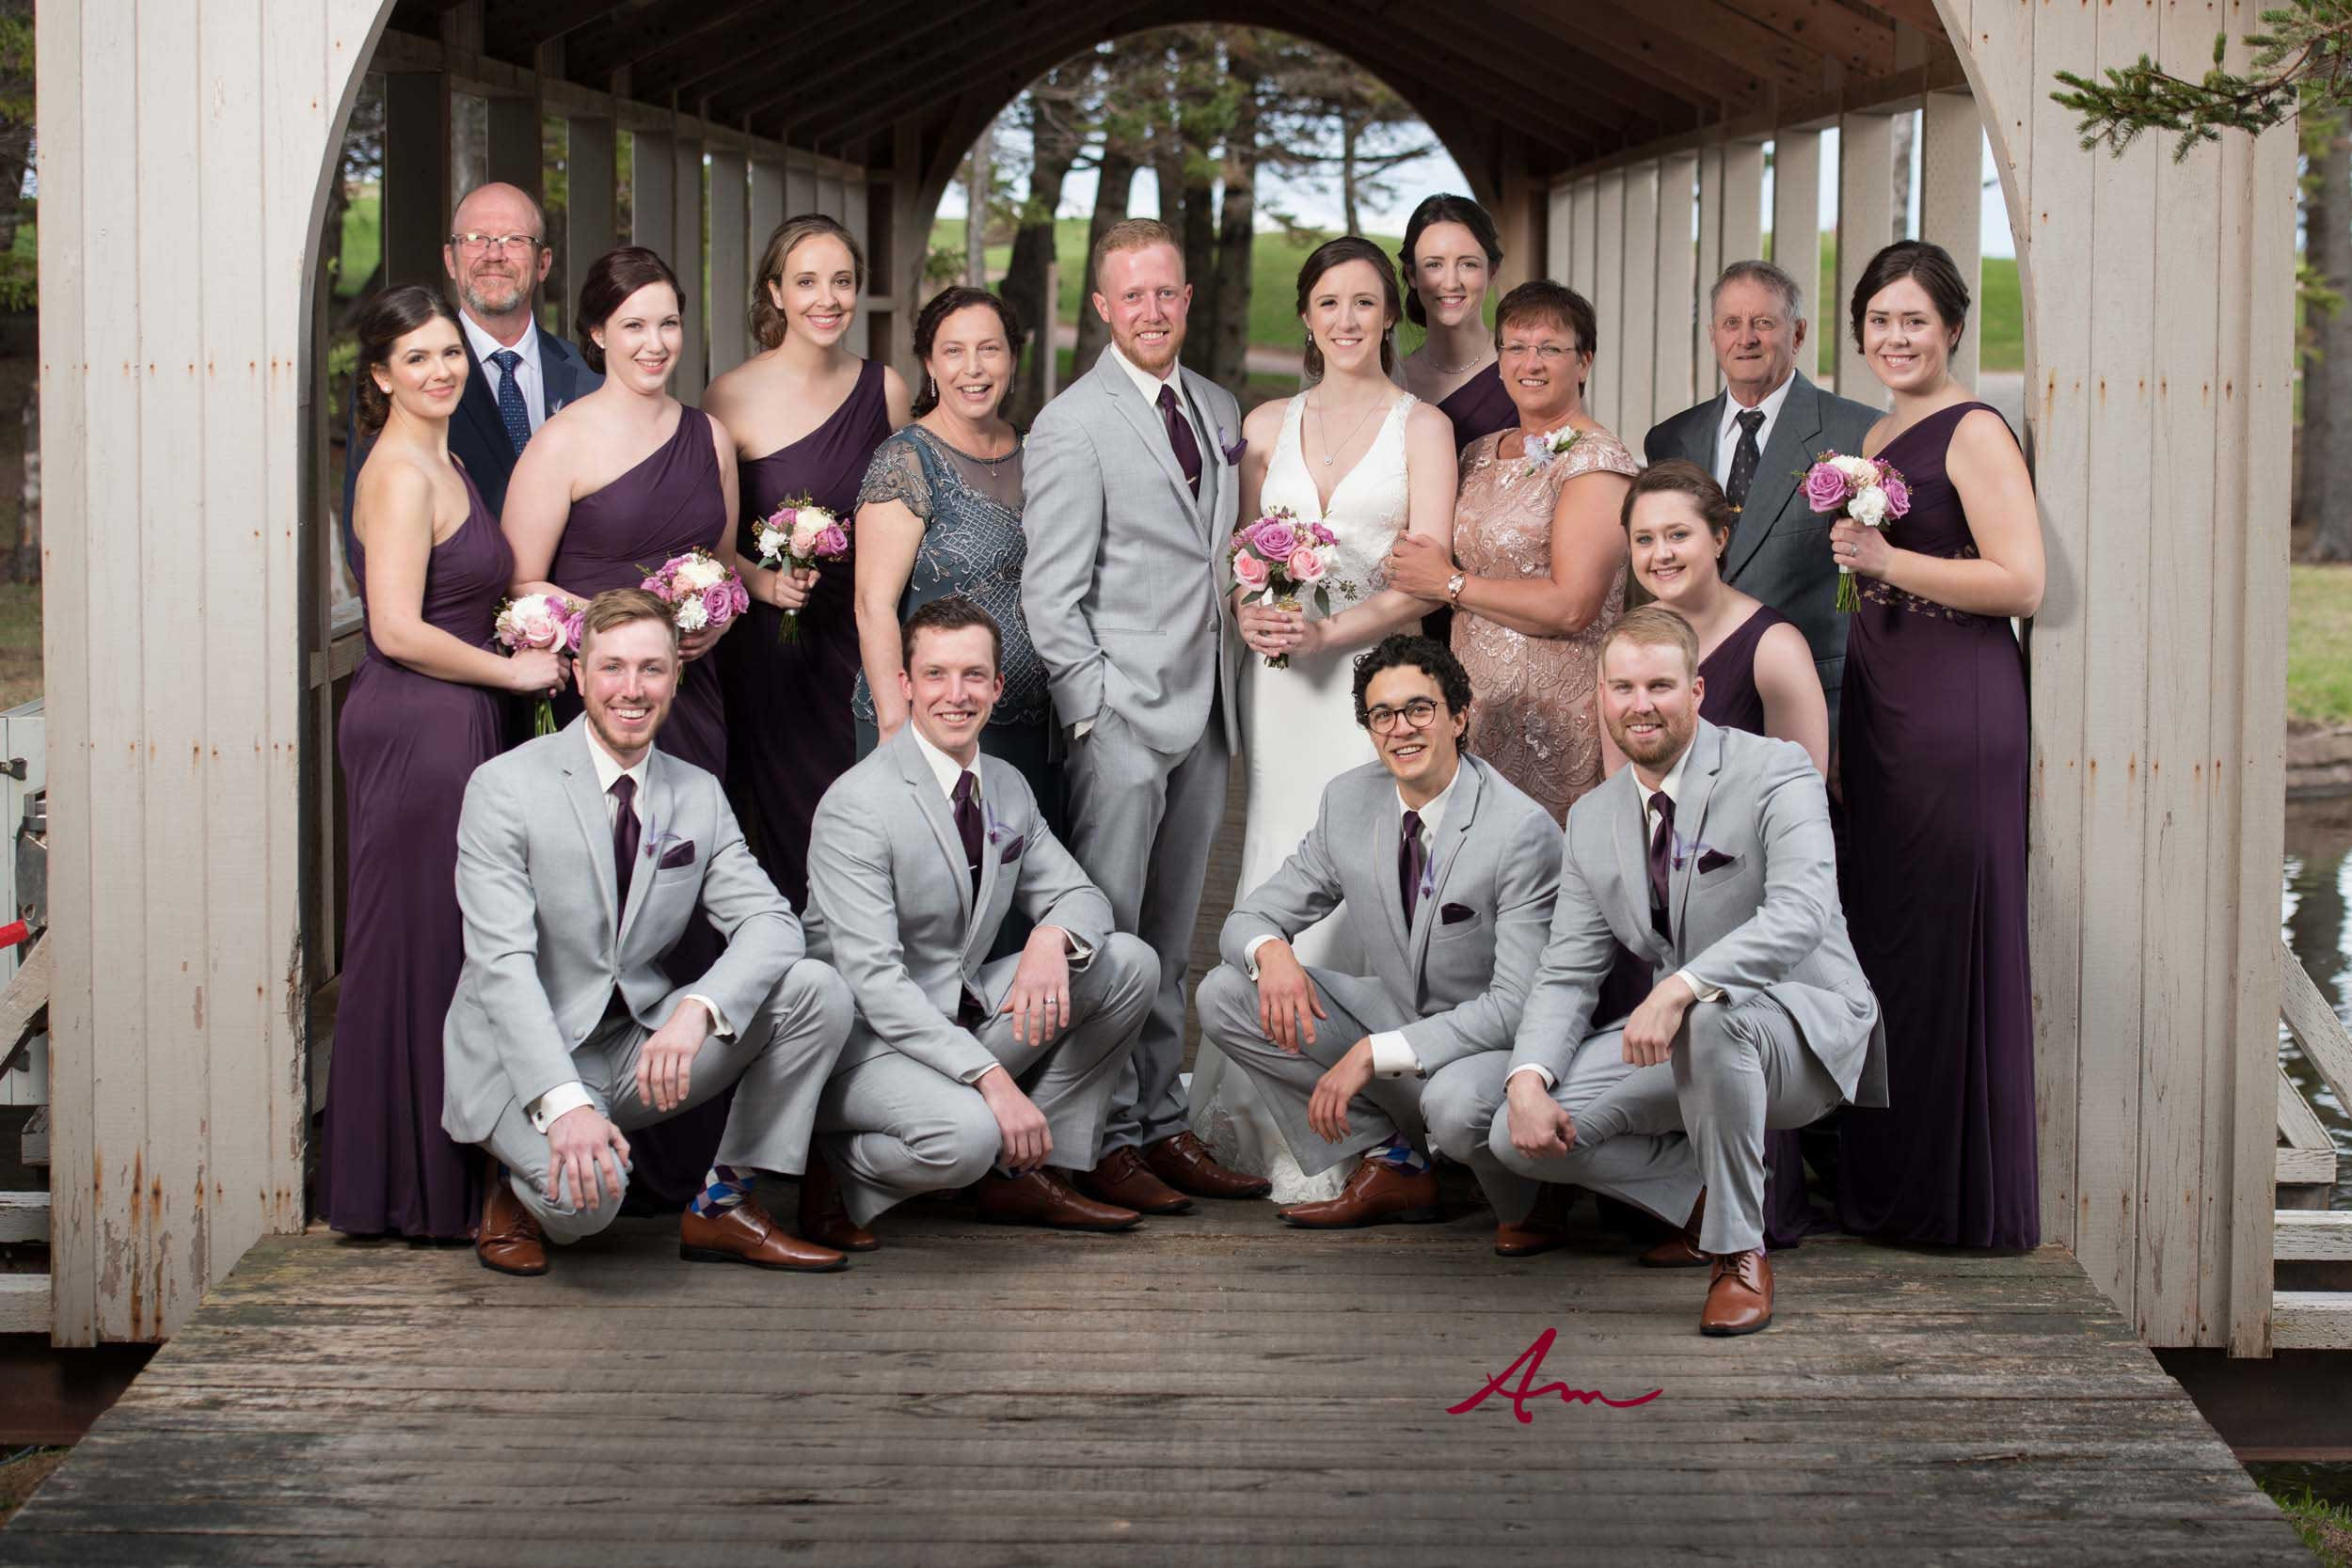 Fox-Harb'r-Wedding-Family-Covered-Bridge.jpg